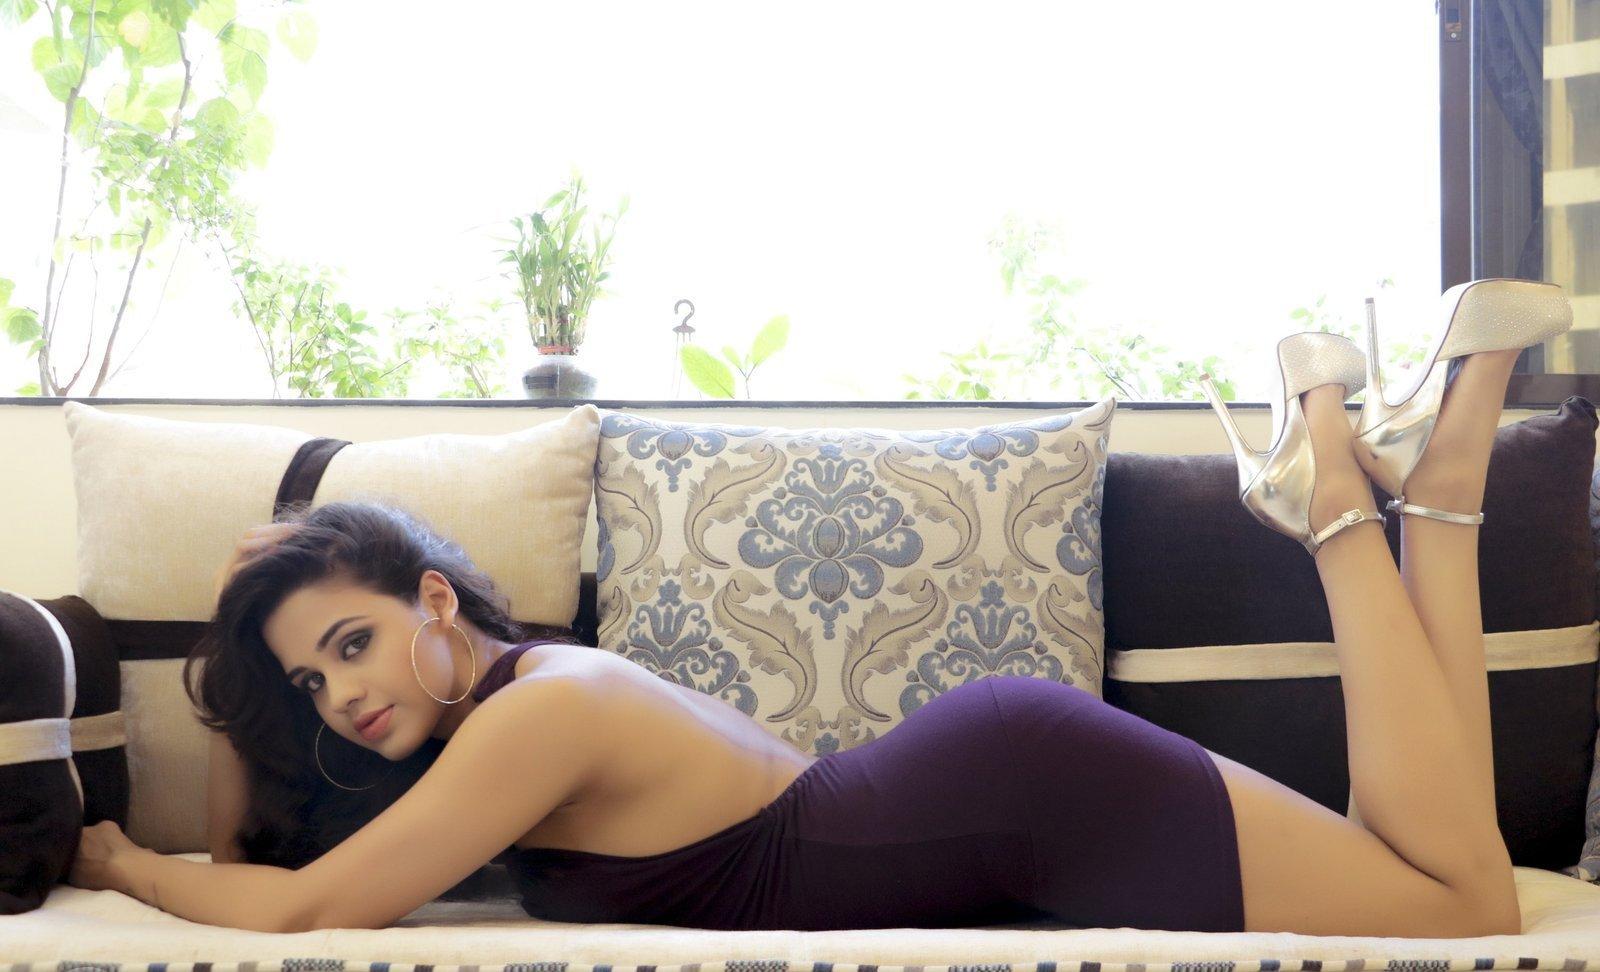 Parina Mirza Ramzan sexy photos in purple dress, Parina Mirza hot pics, Parina Mirza spicy photos